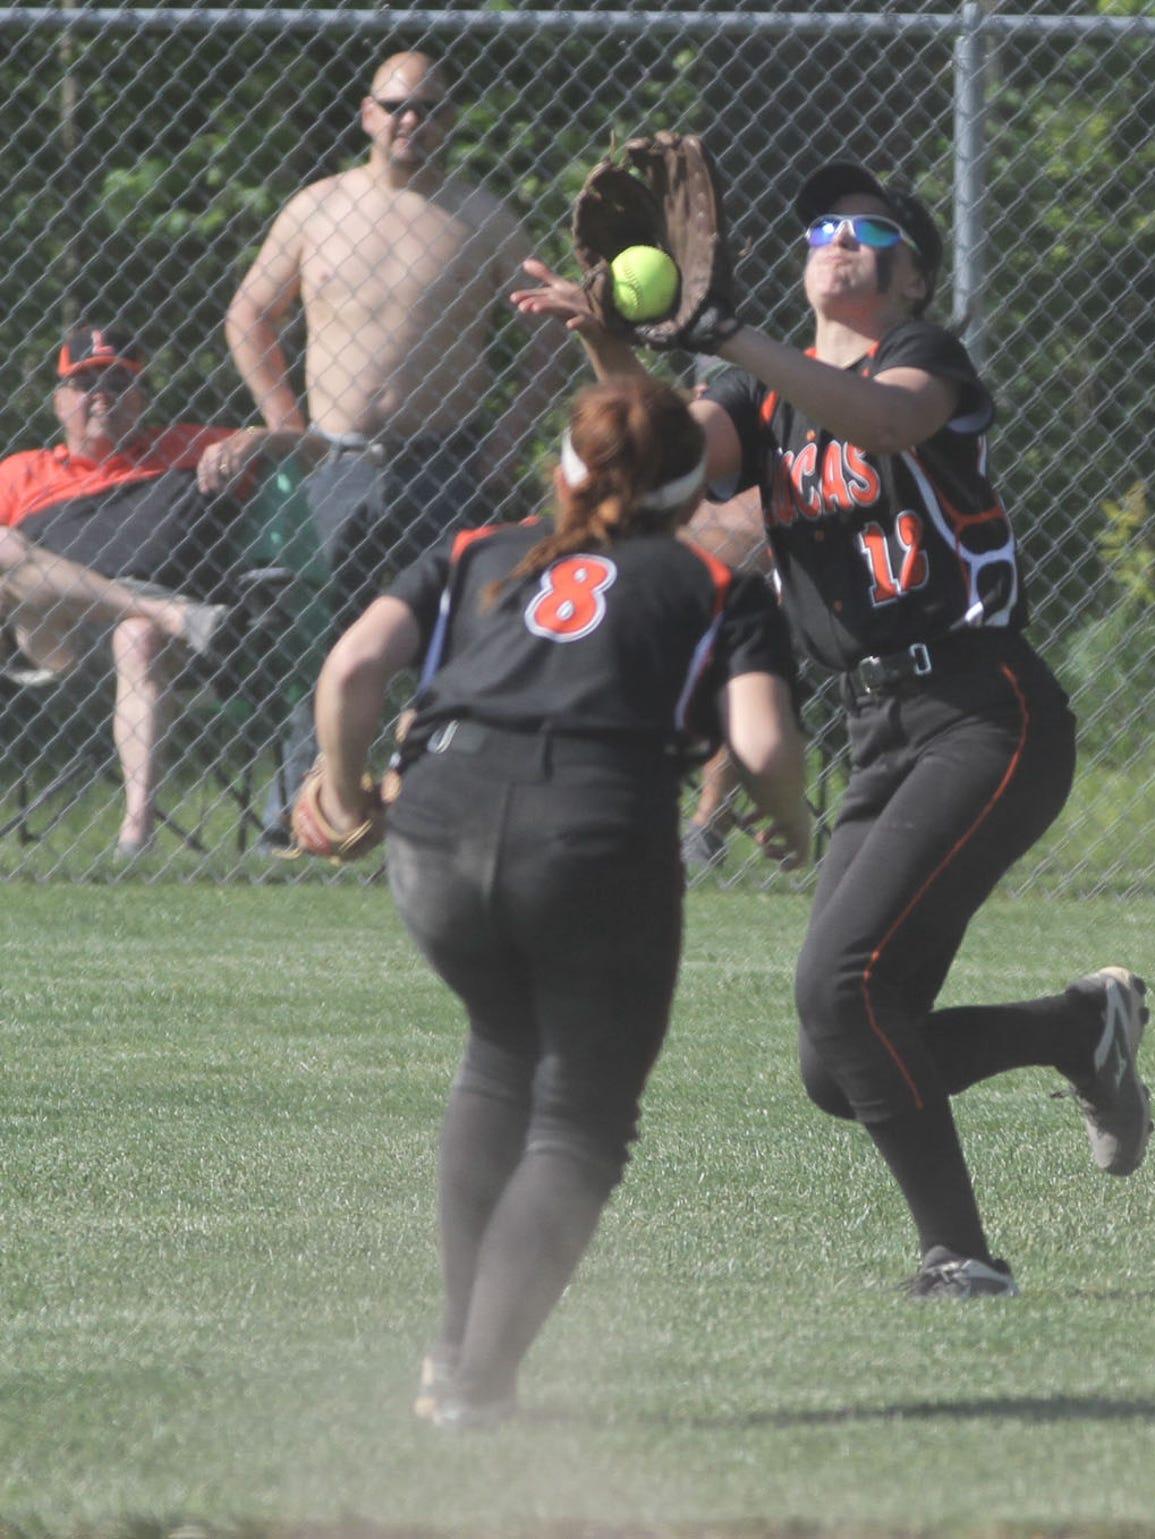 Lucas' Morgan Spitler catches the ball infront of Alex